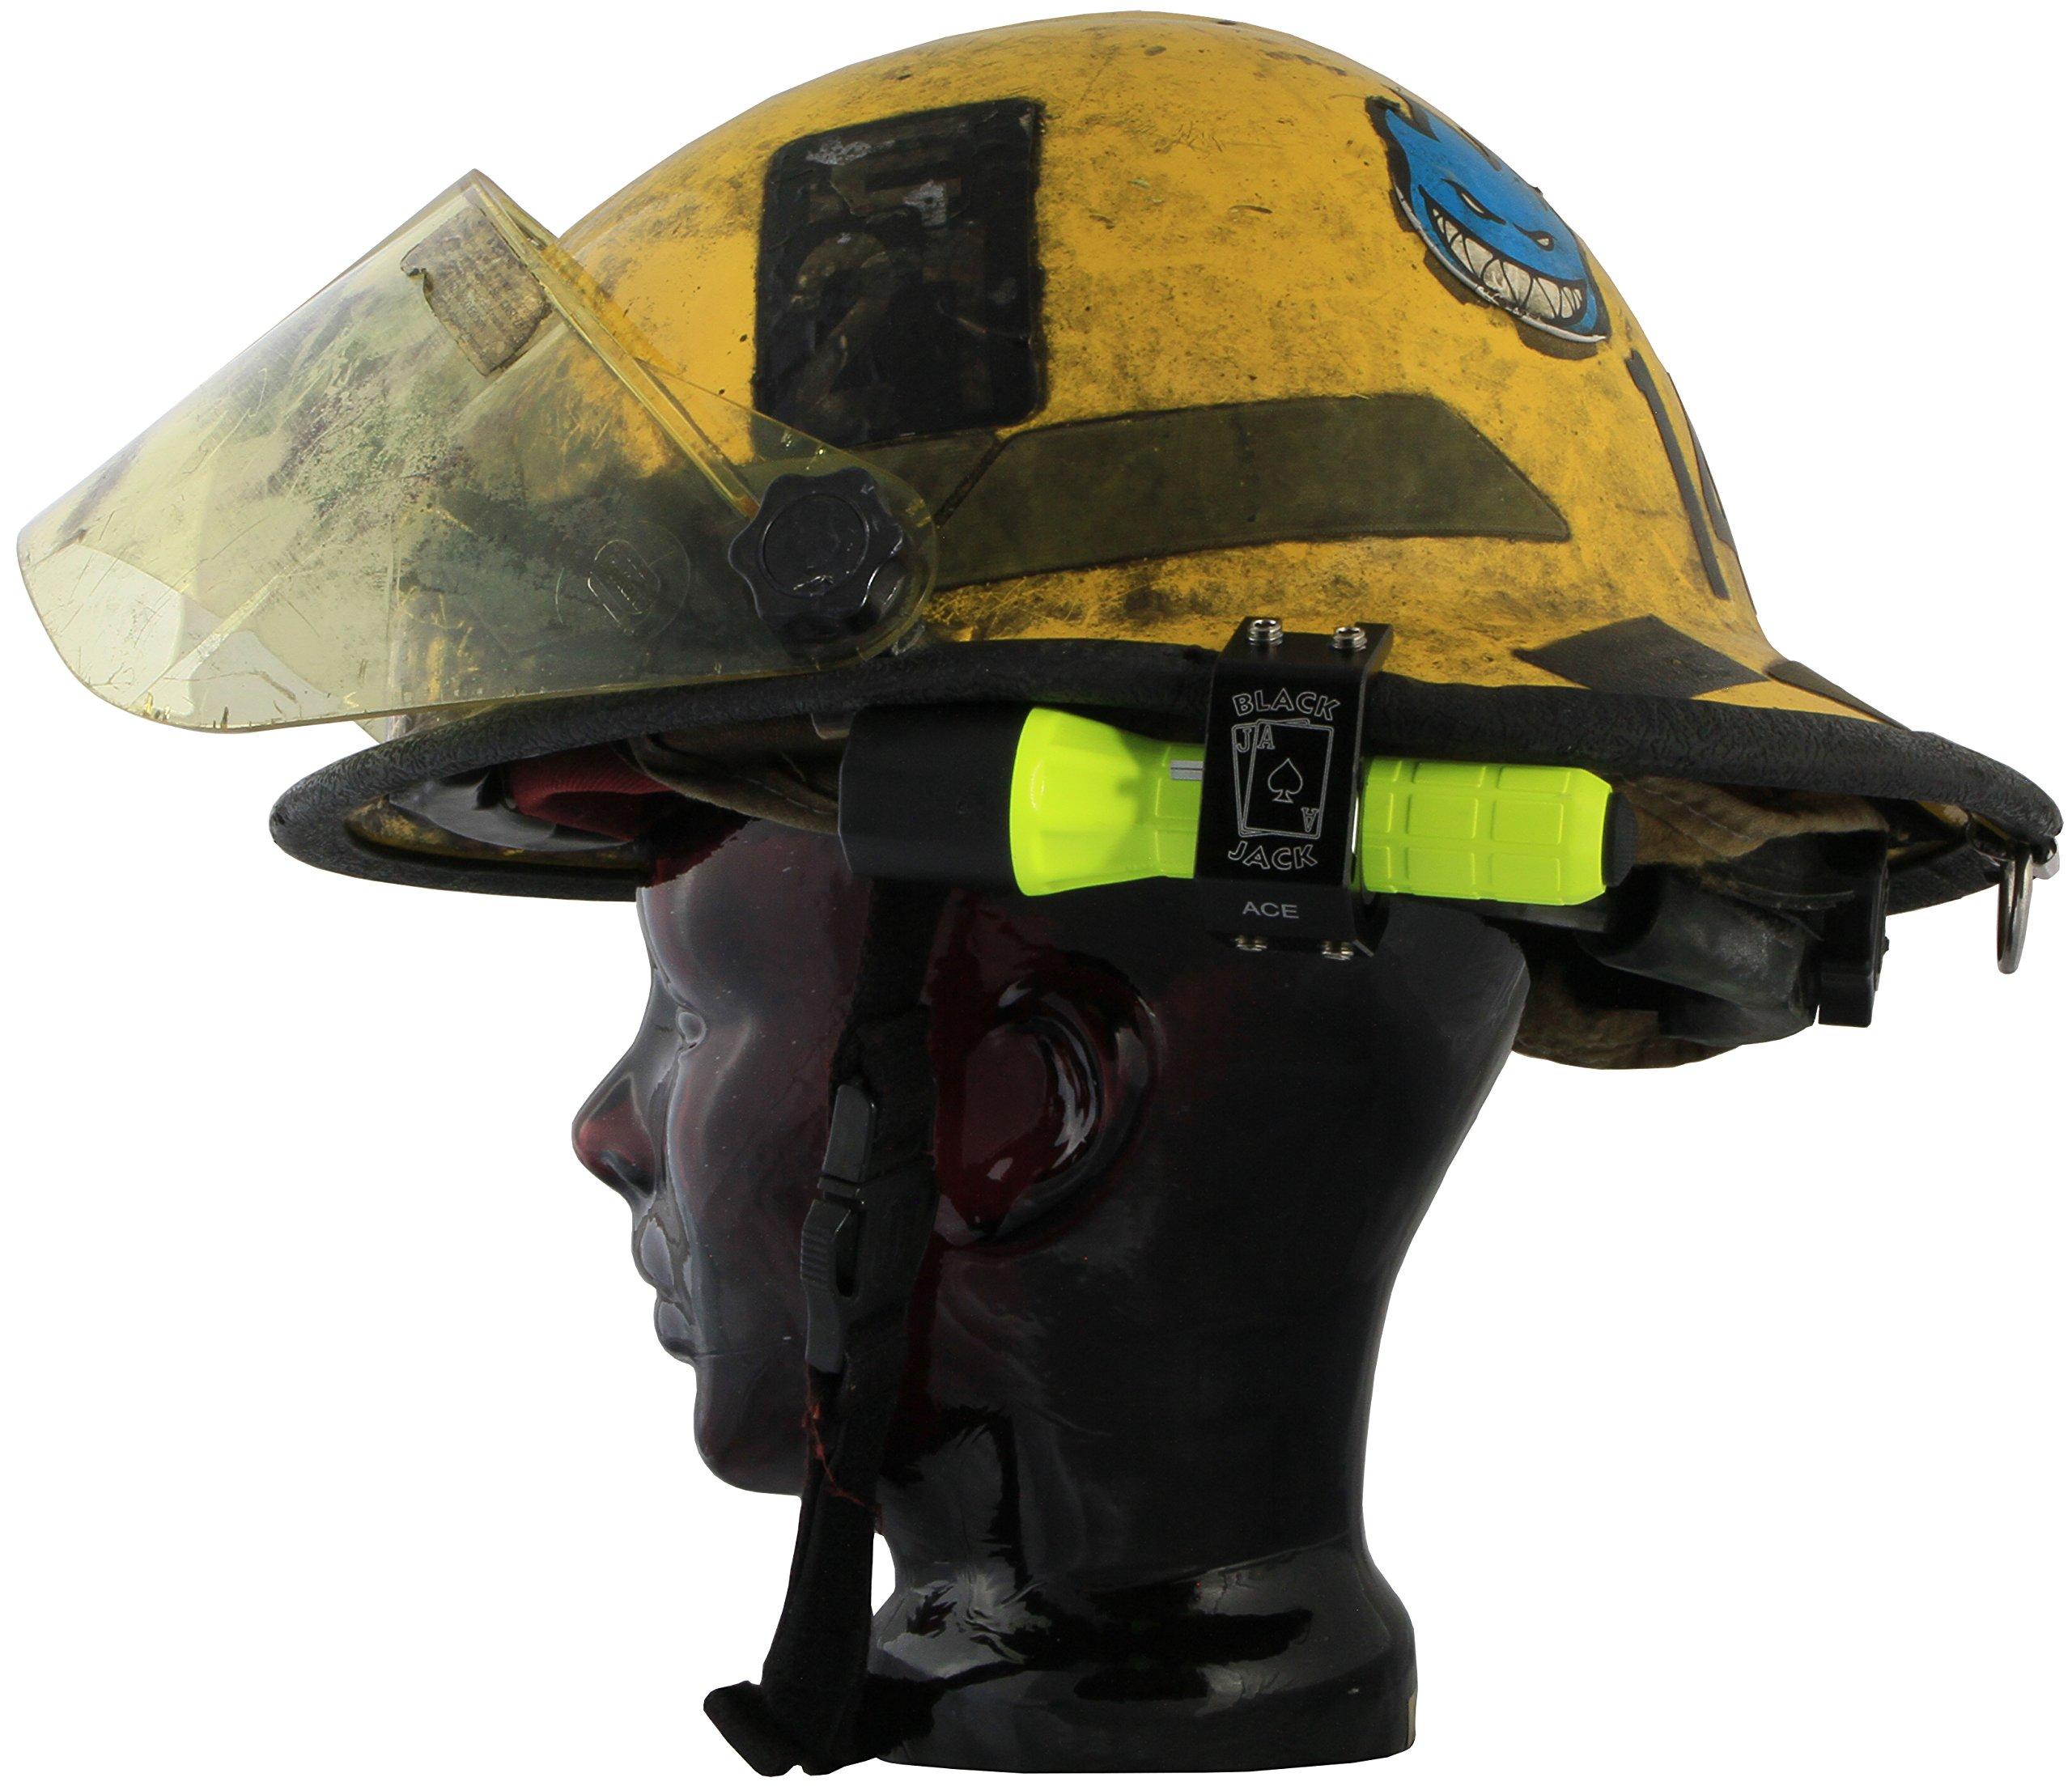 Blackjack ACE Firefighter Helmet Aluminum Flashlight Holder by Blackjack Fire & Safety (Image #5)